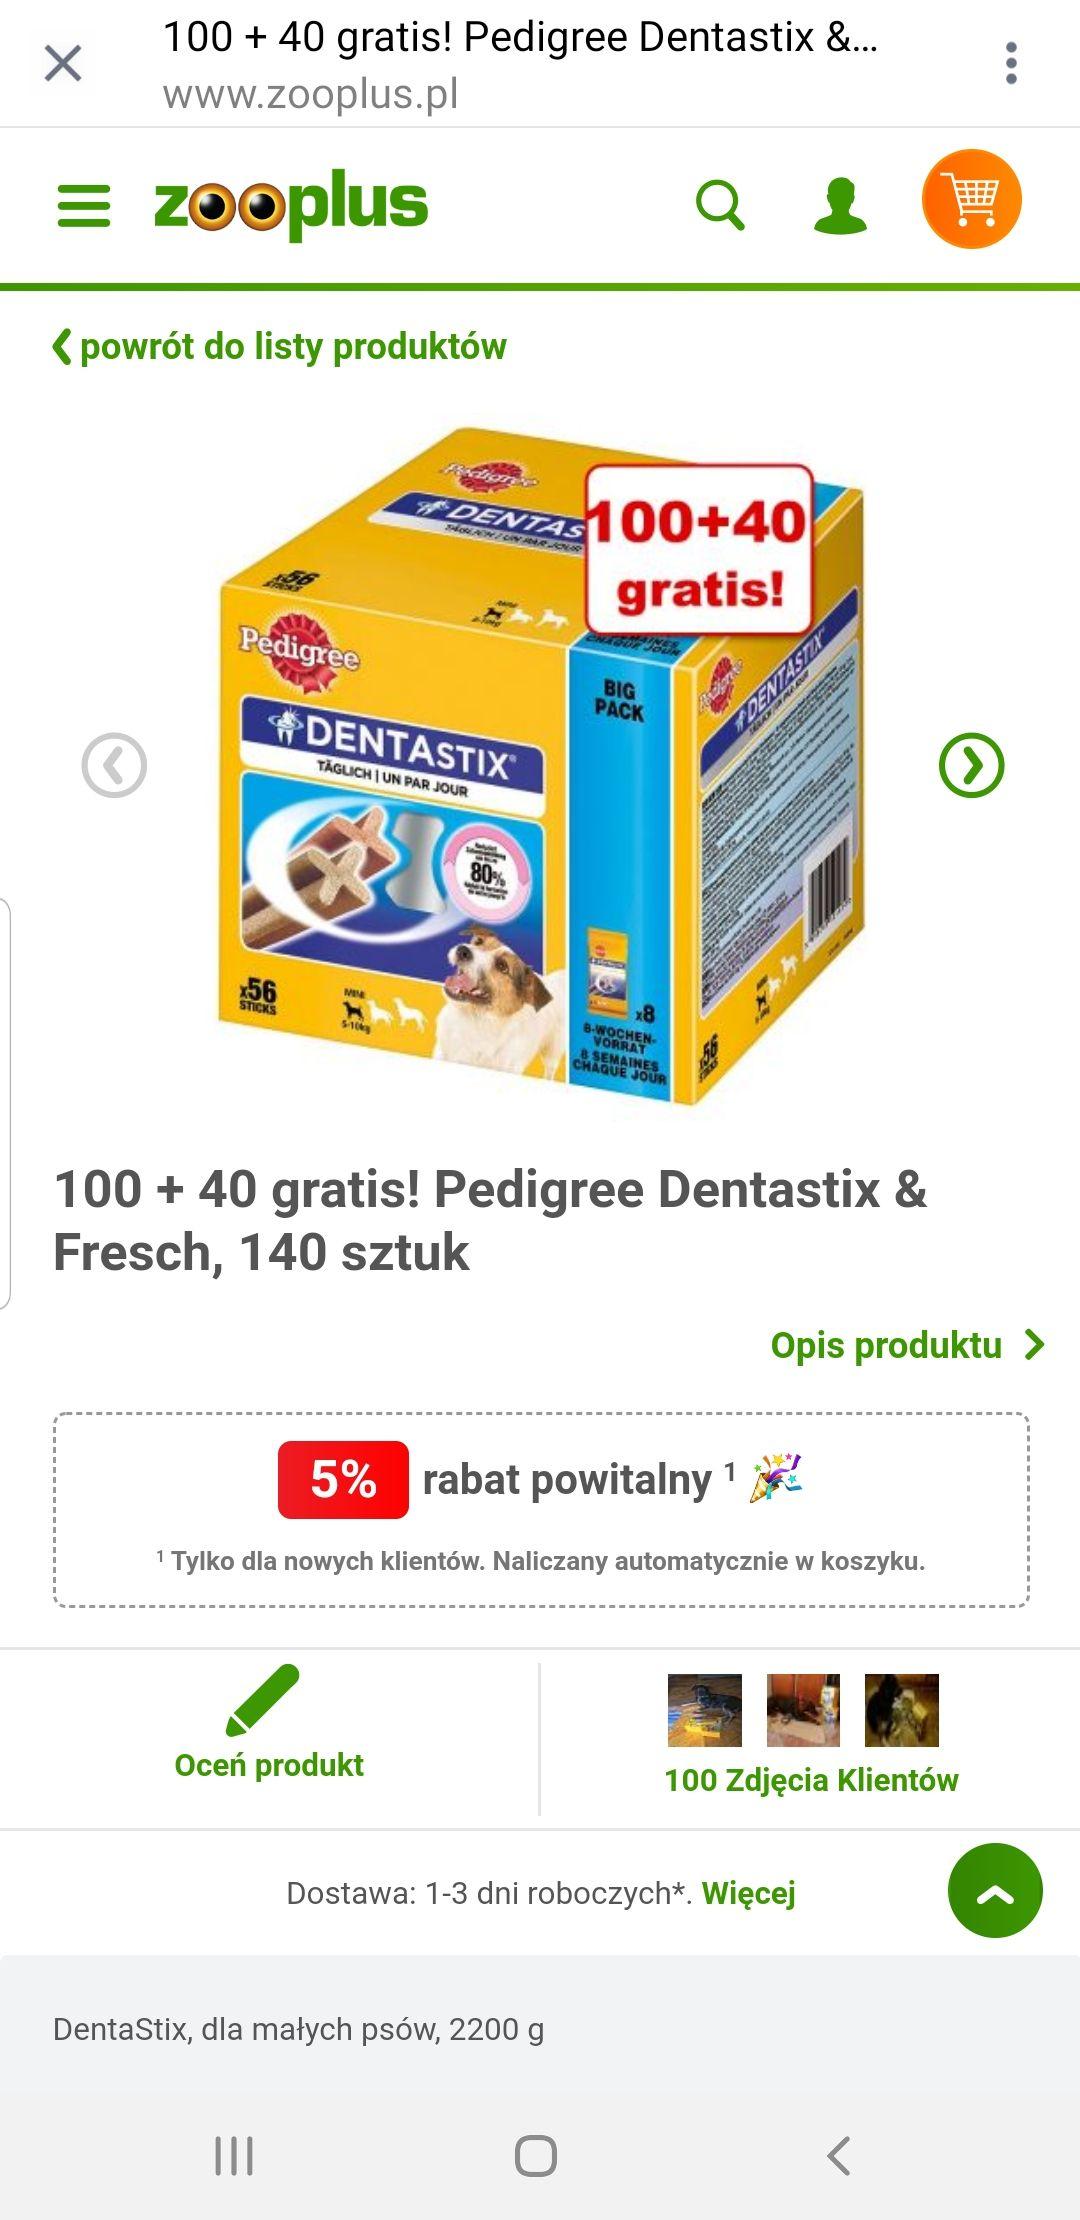 Dentastix 100 + 40 gratis w zooplus.